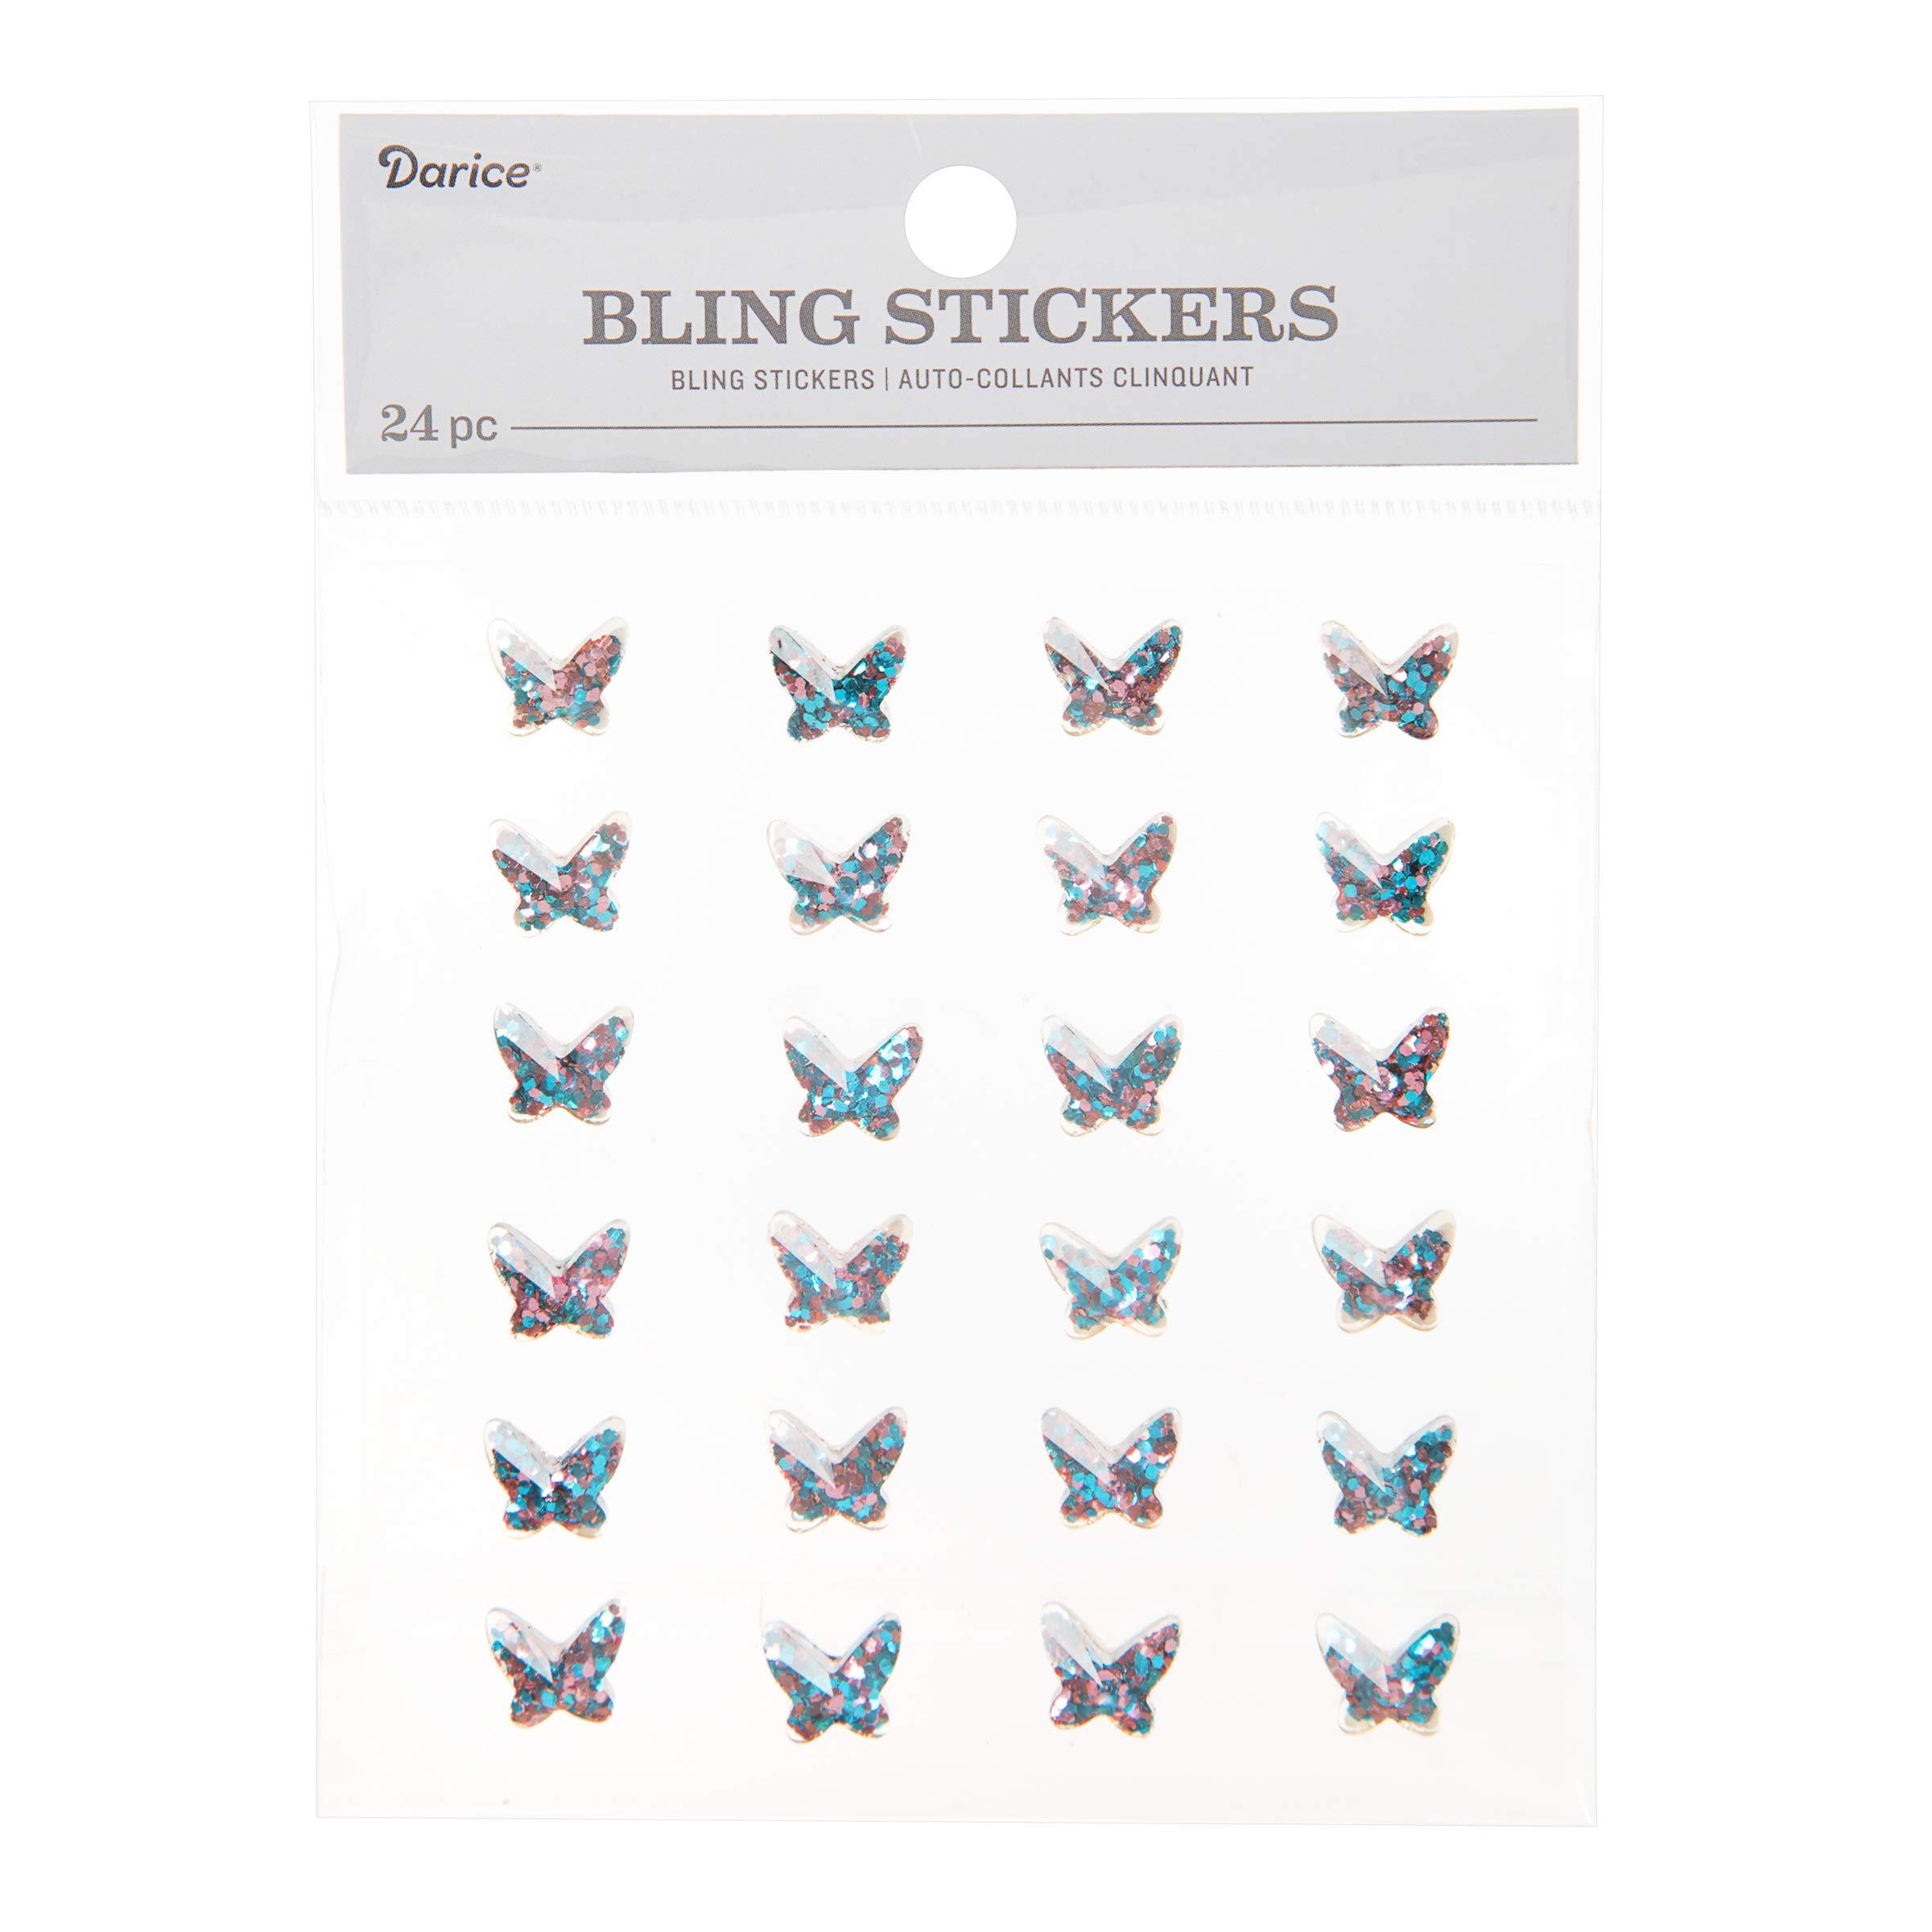 Darice Glitter Butterfly 24 Piece Bling Stickers, Iridescent Blue/Pink